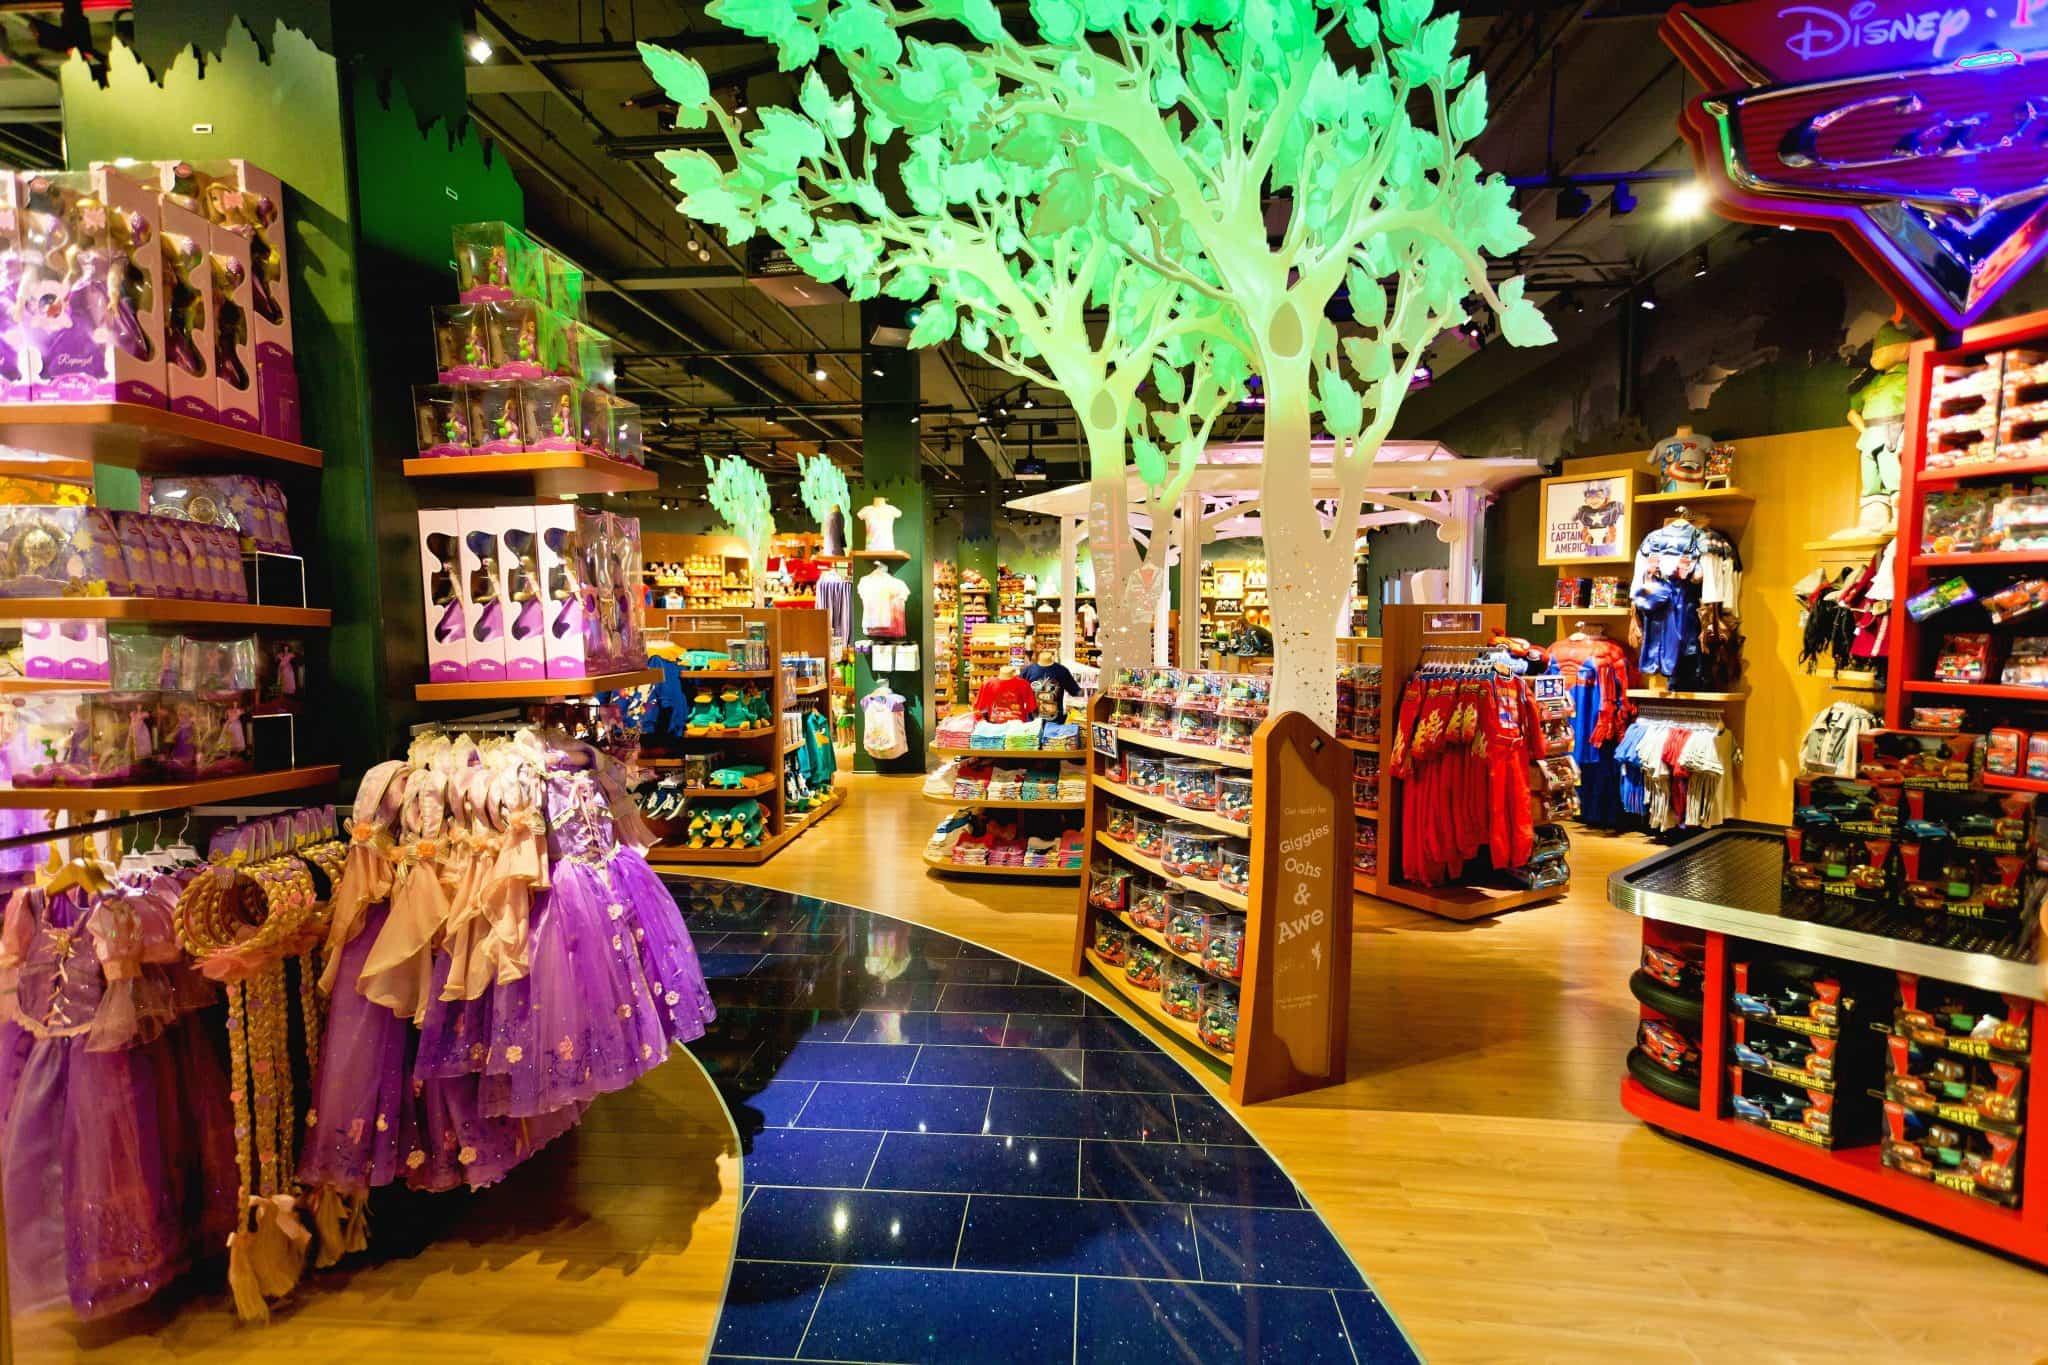 Disney world gift shop coupons